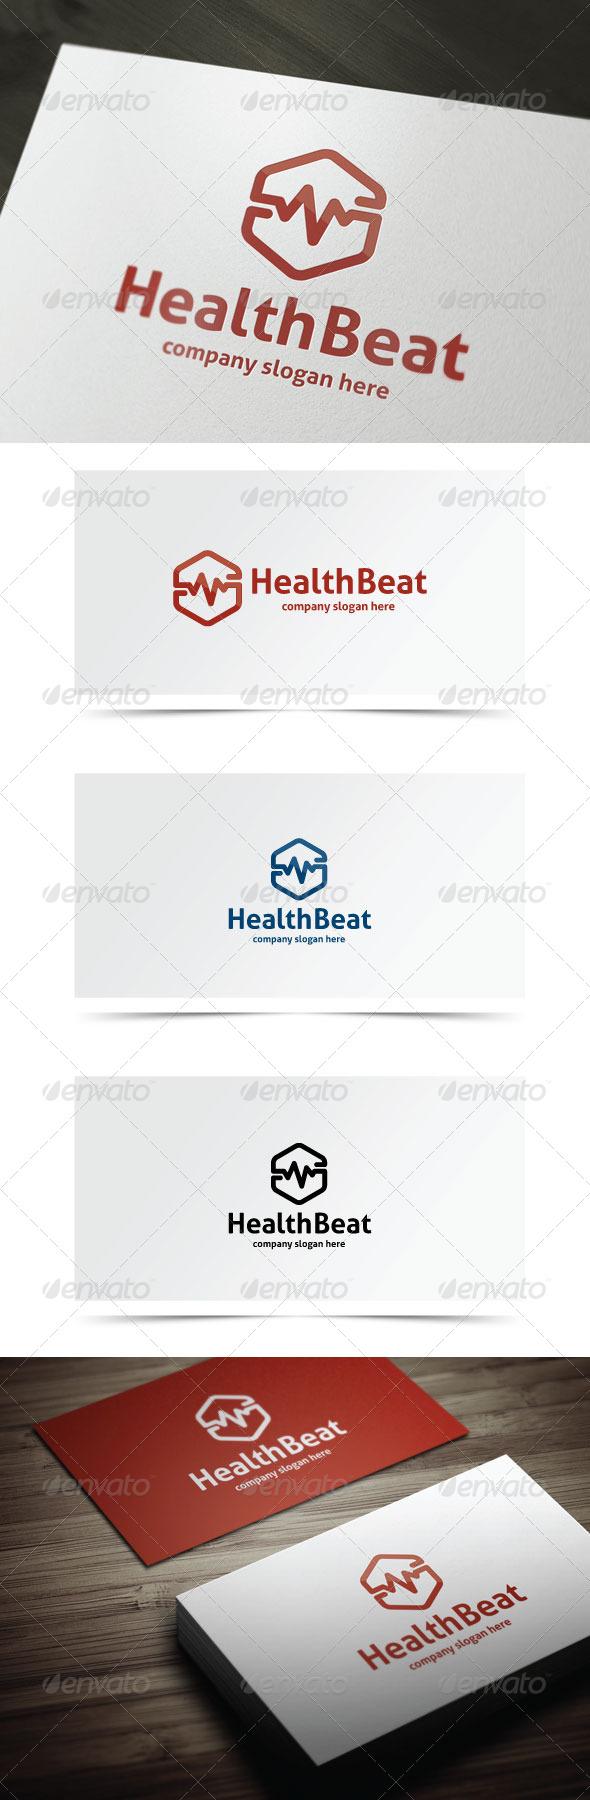 GraphicRiver Health Beat 6853004